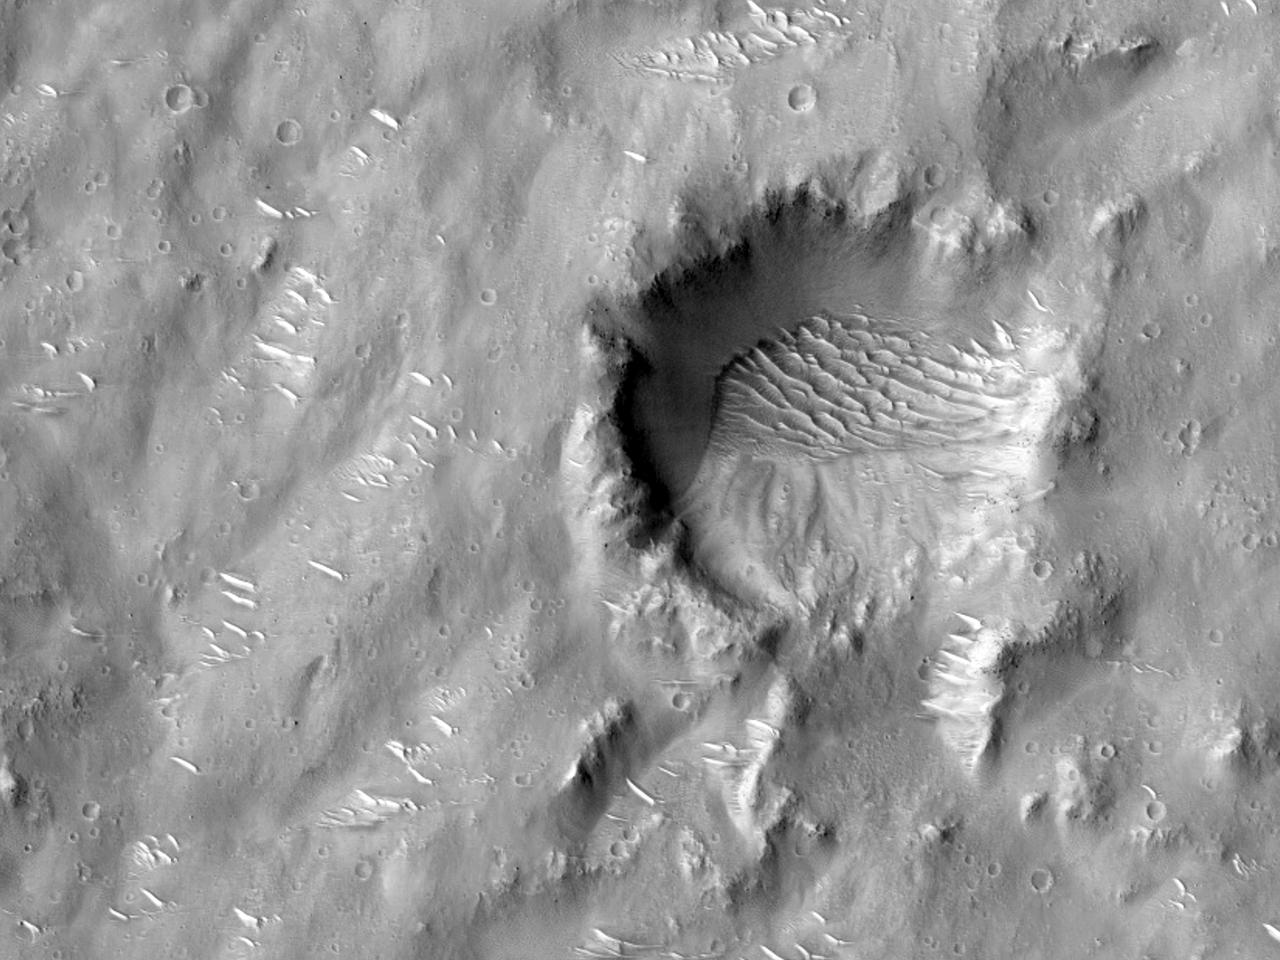 Terreng inntil krater i Isidis Planitia